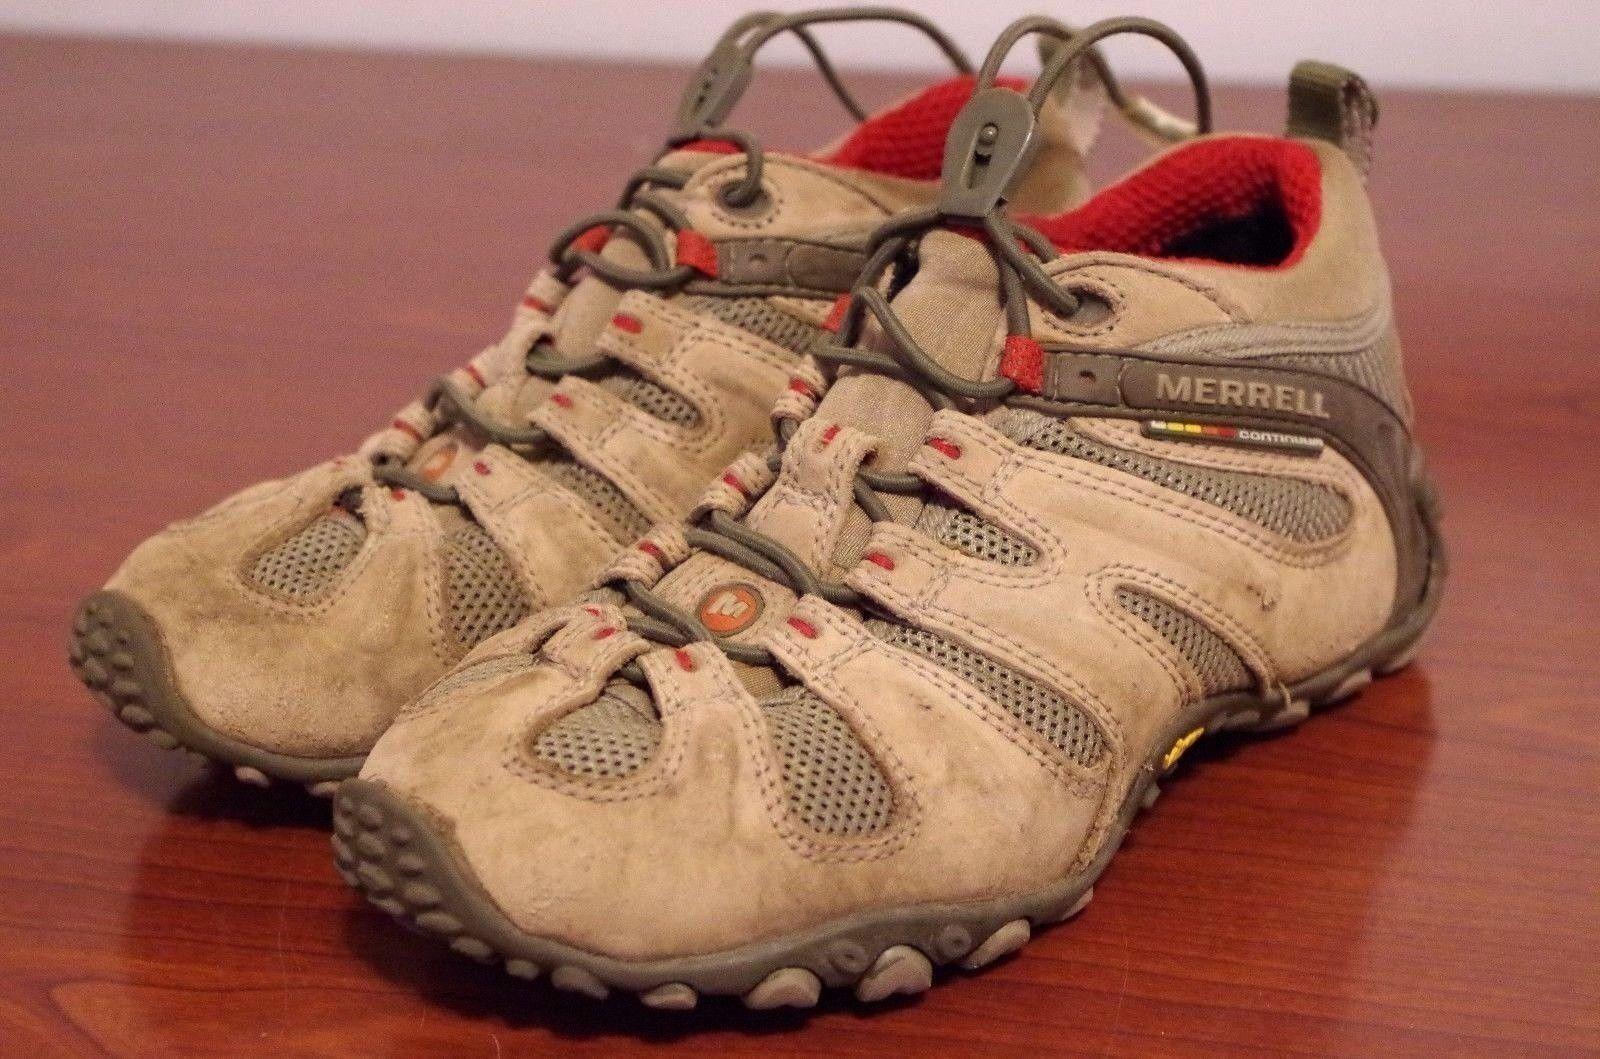 Merrell Chameleon II Stretch Light Brown Vibram Hiking shoes Women's Sz 6.5